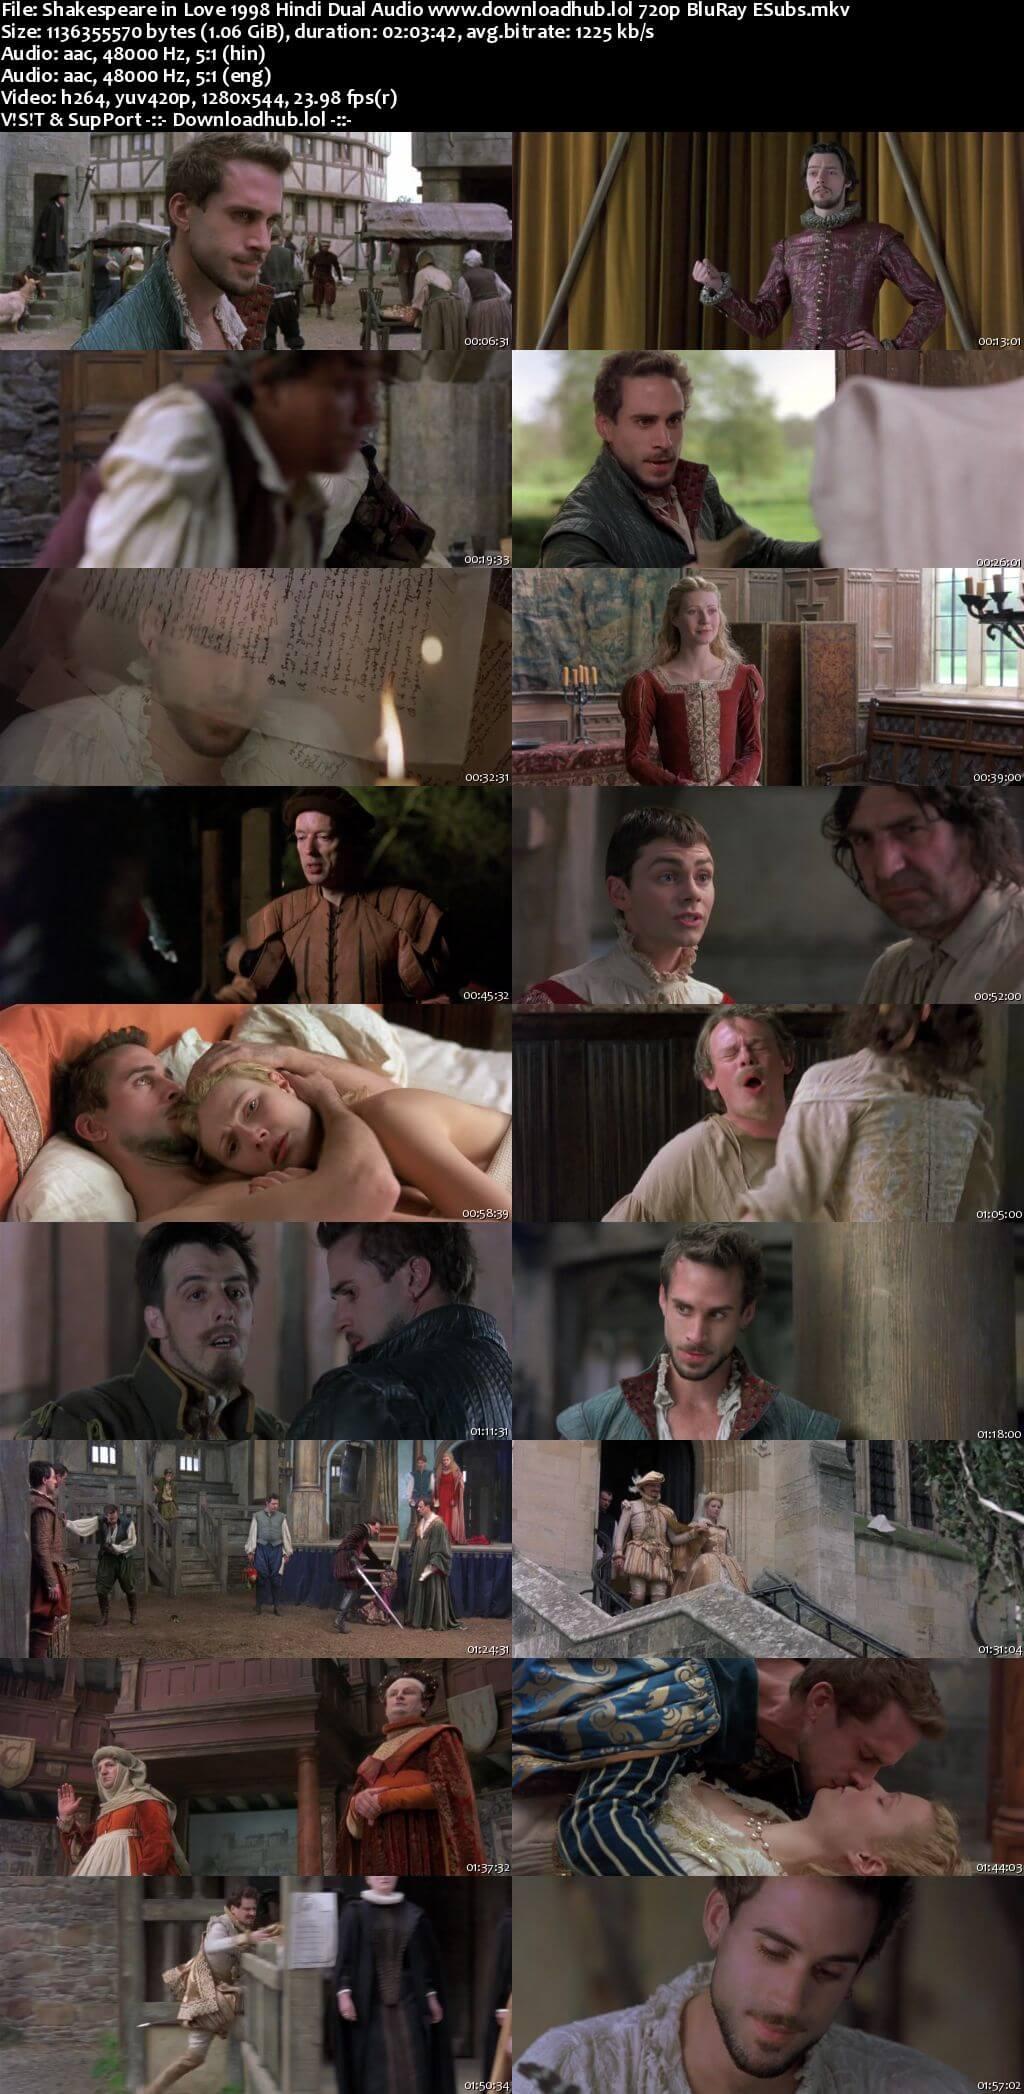 Shakespeare in Love 1998 Hindi Dual Audio 720p BluRay ESubs